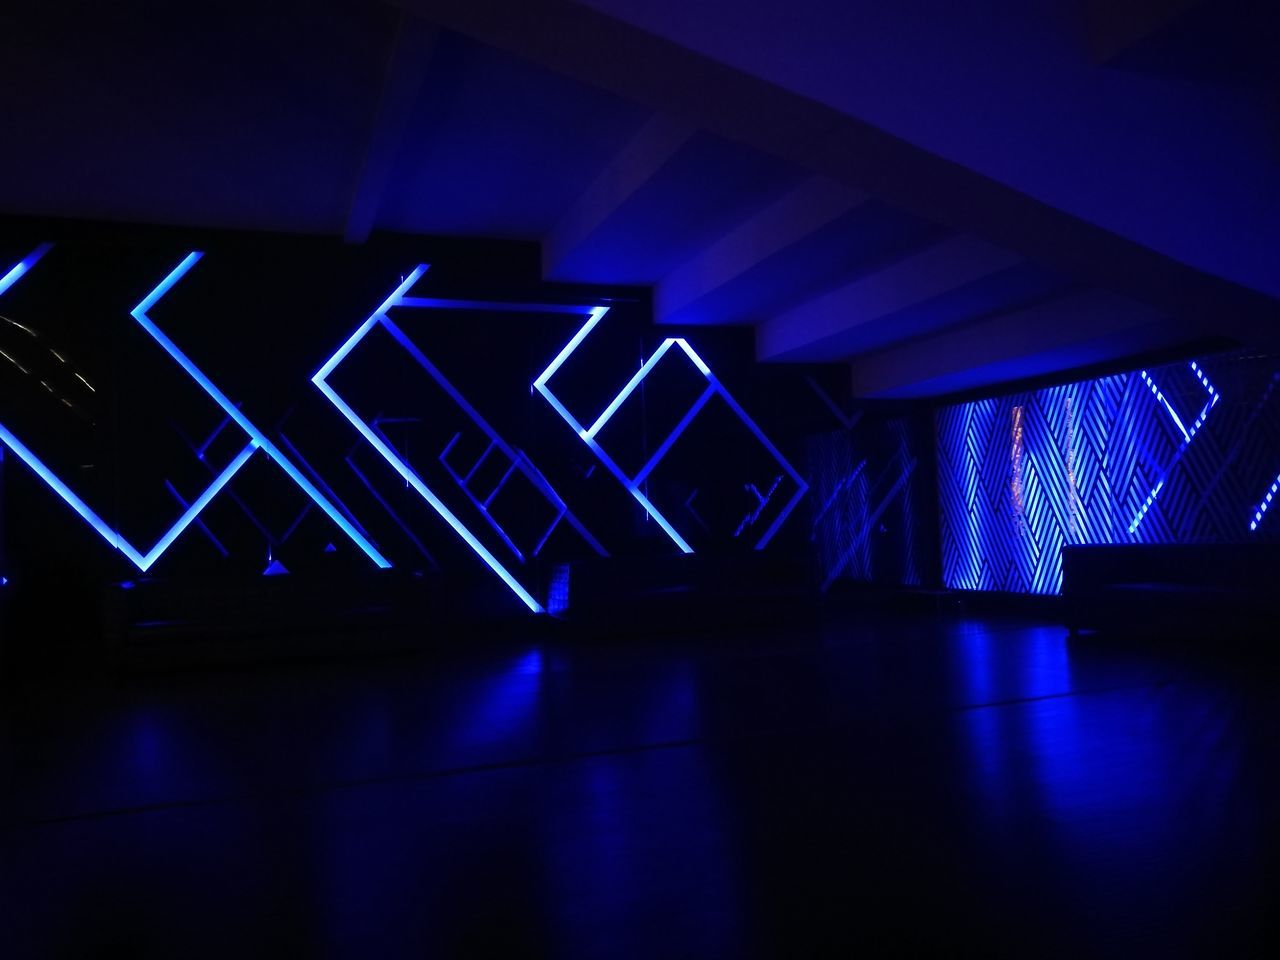 Night Illuminated Indoors  CinemaTime Cinestar HuaweiP9